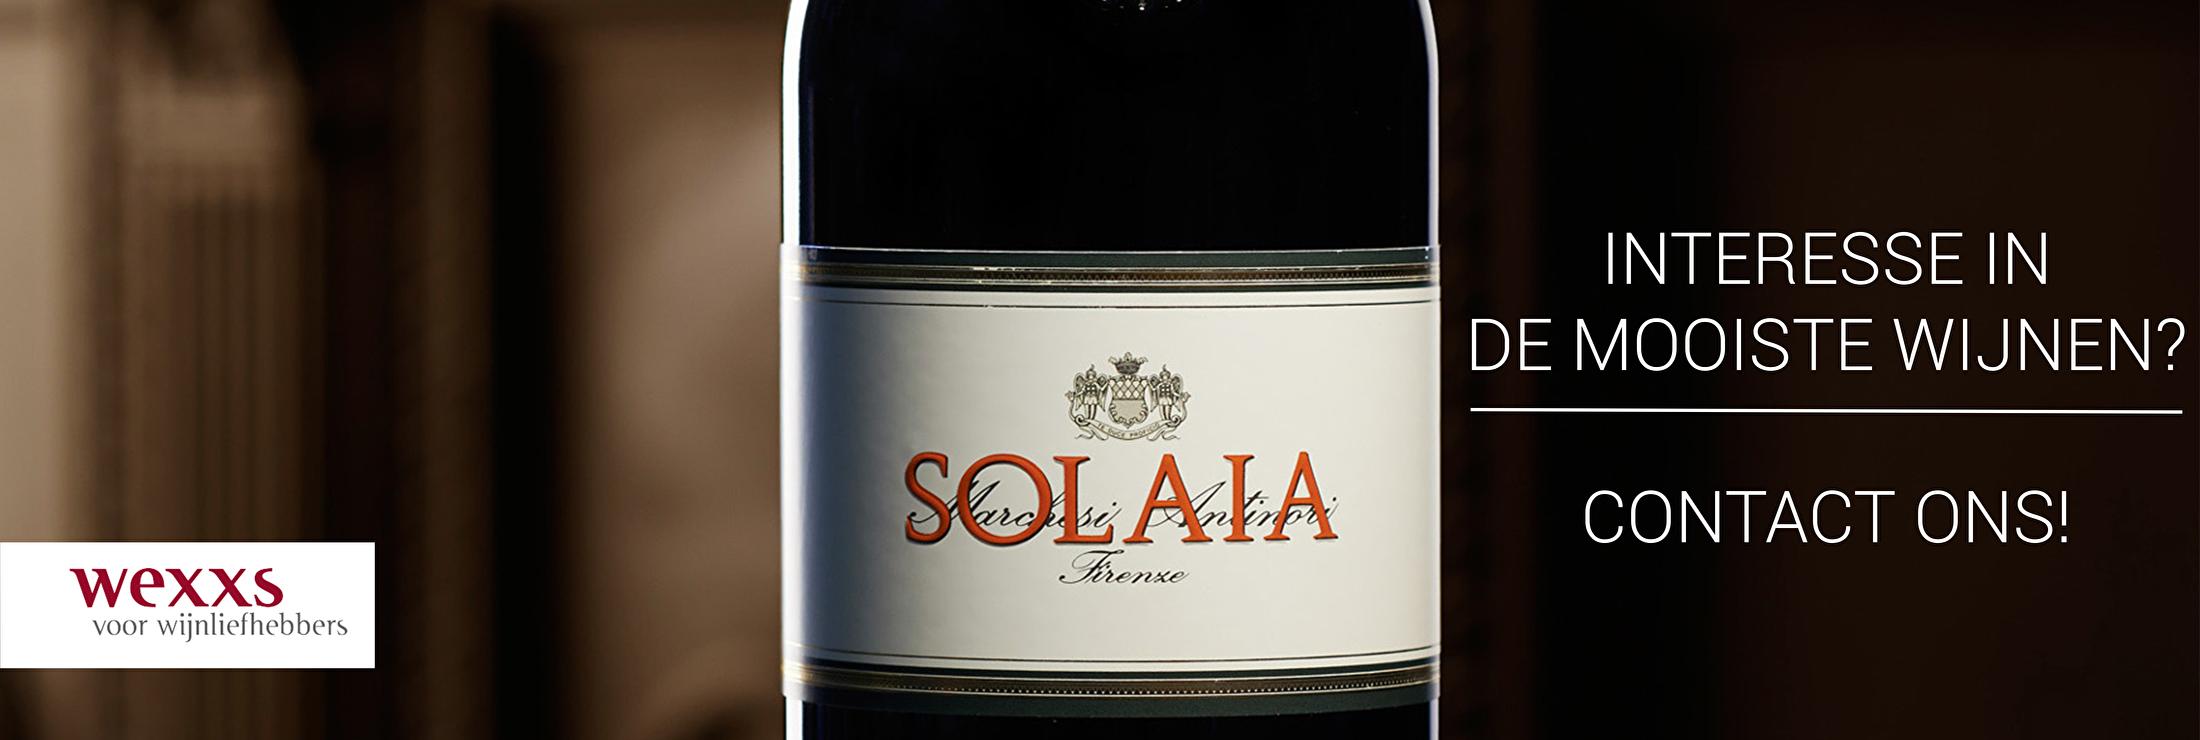 Solaia, neem contact op